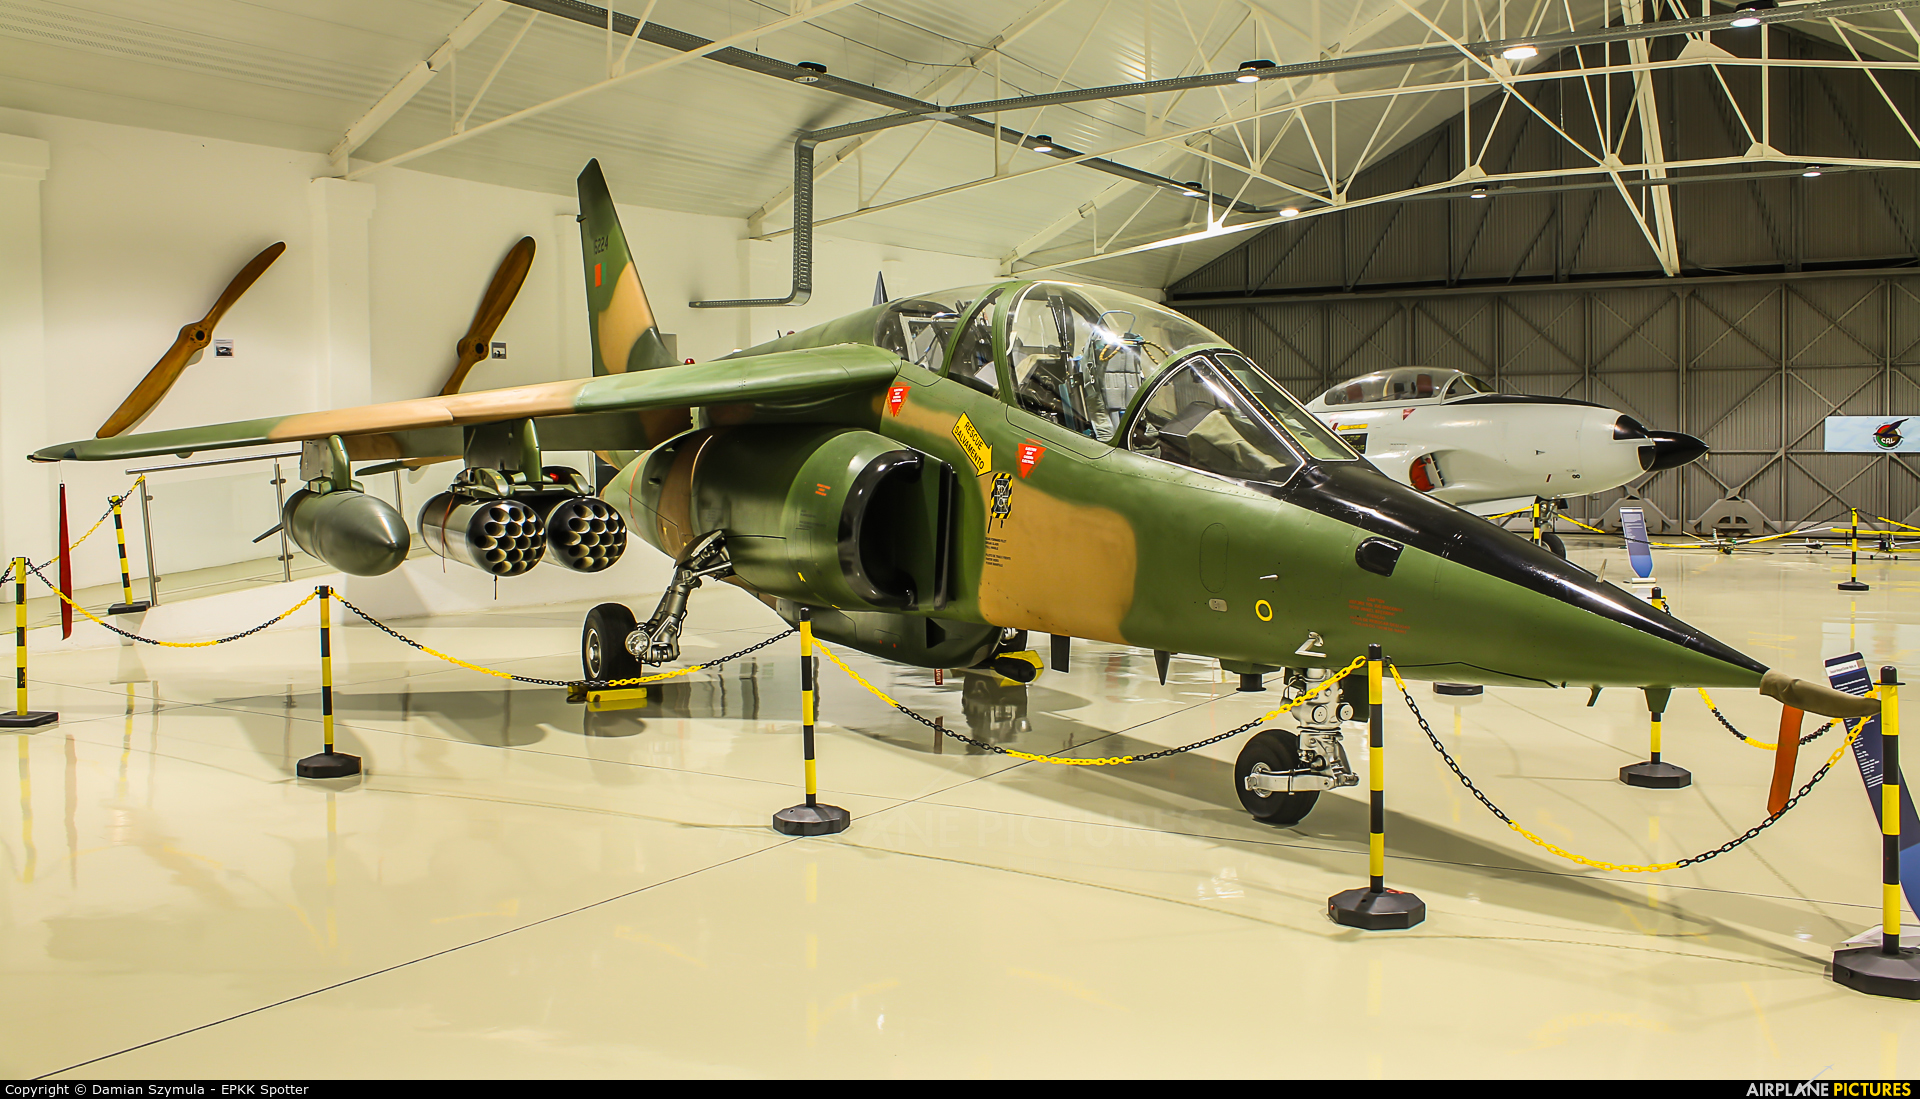 Portugal - Air Force 15224 aircraft at Sintra